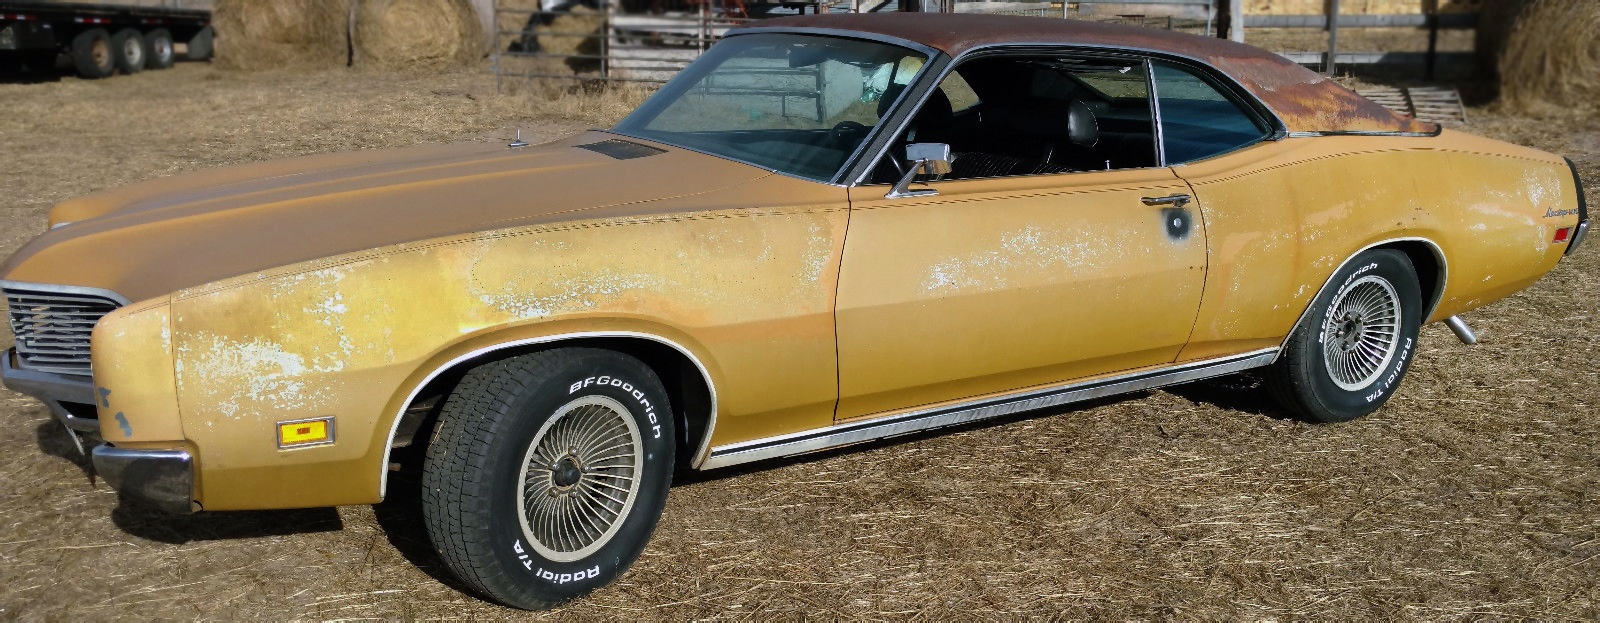 Muscle Car? \'70 Mercury Montego MX Brougham